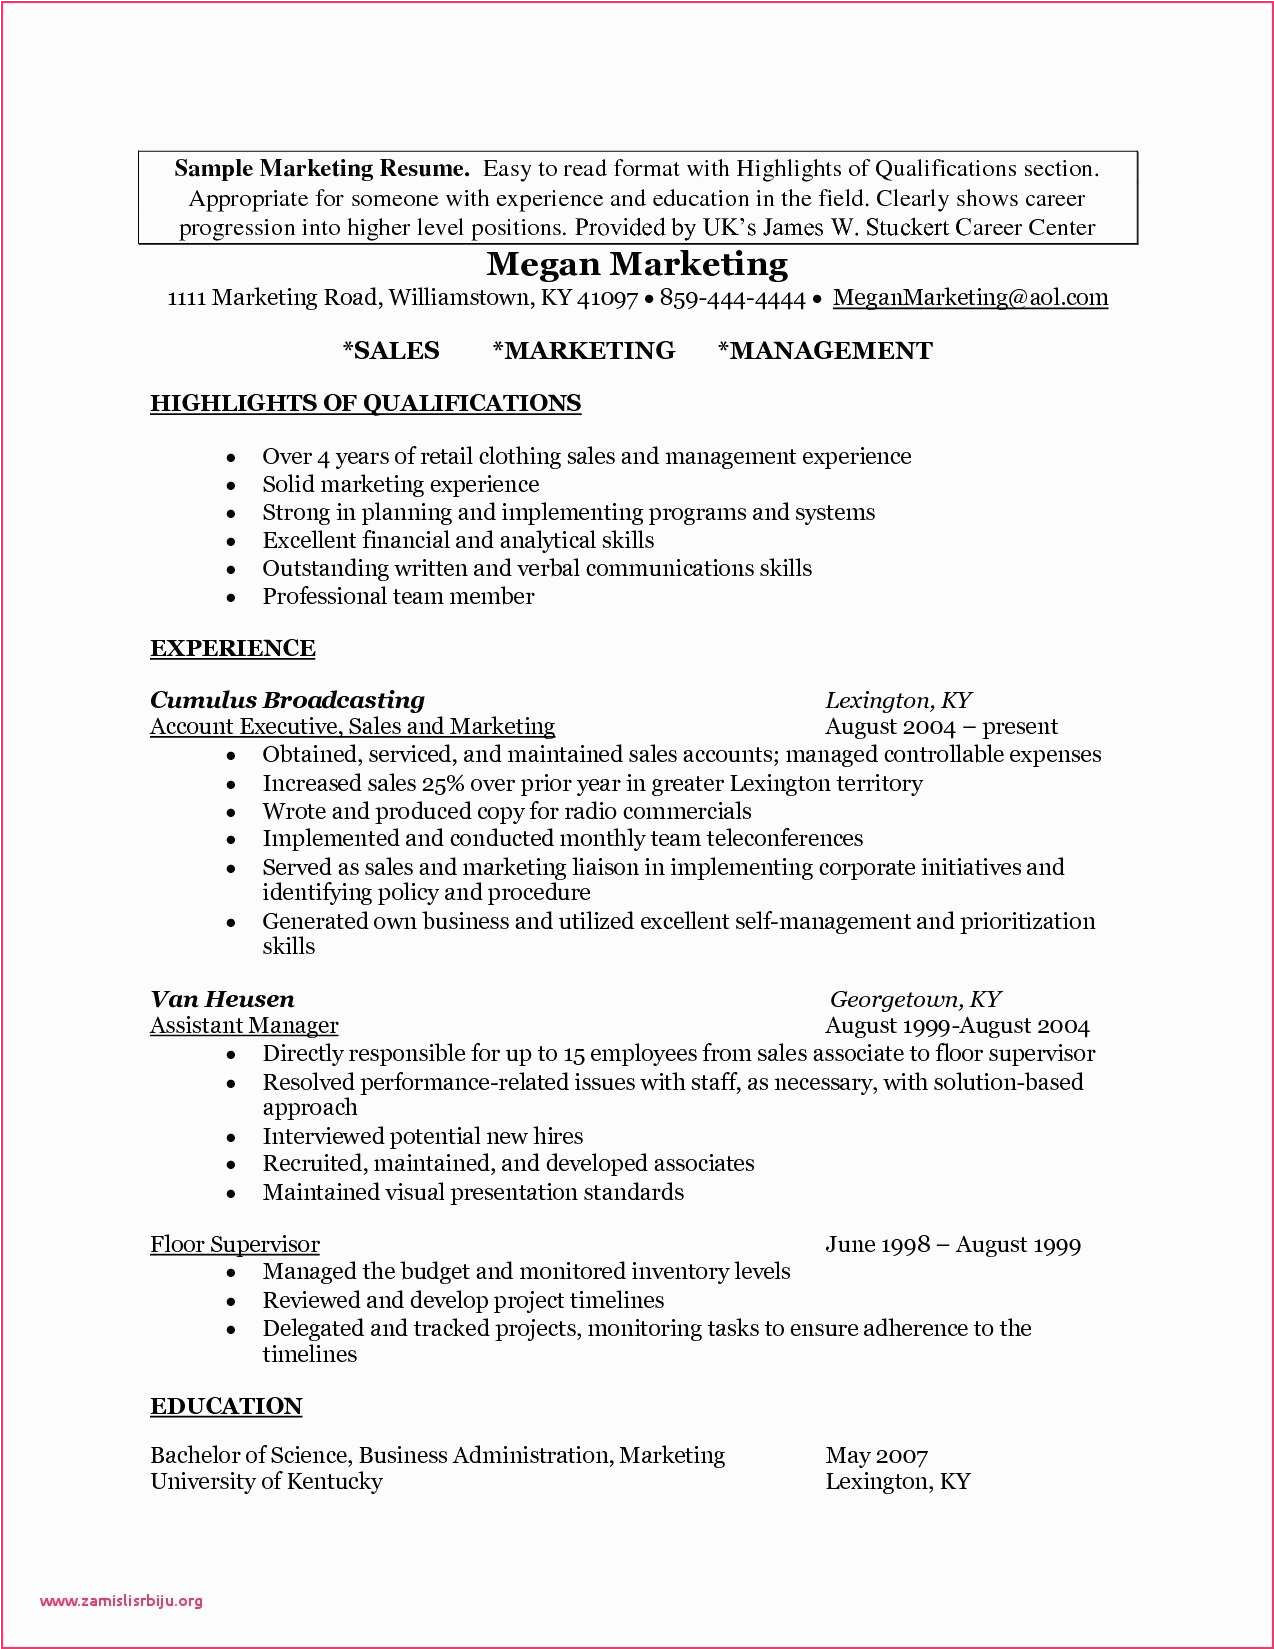 sample resume cover letter marketing manager